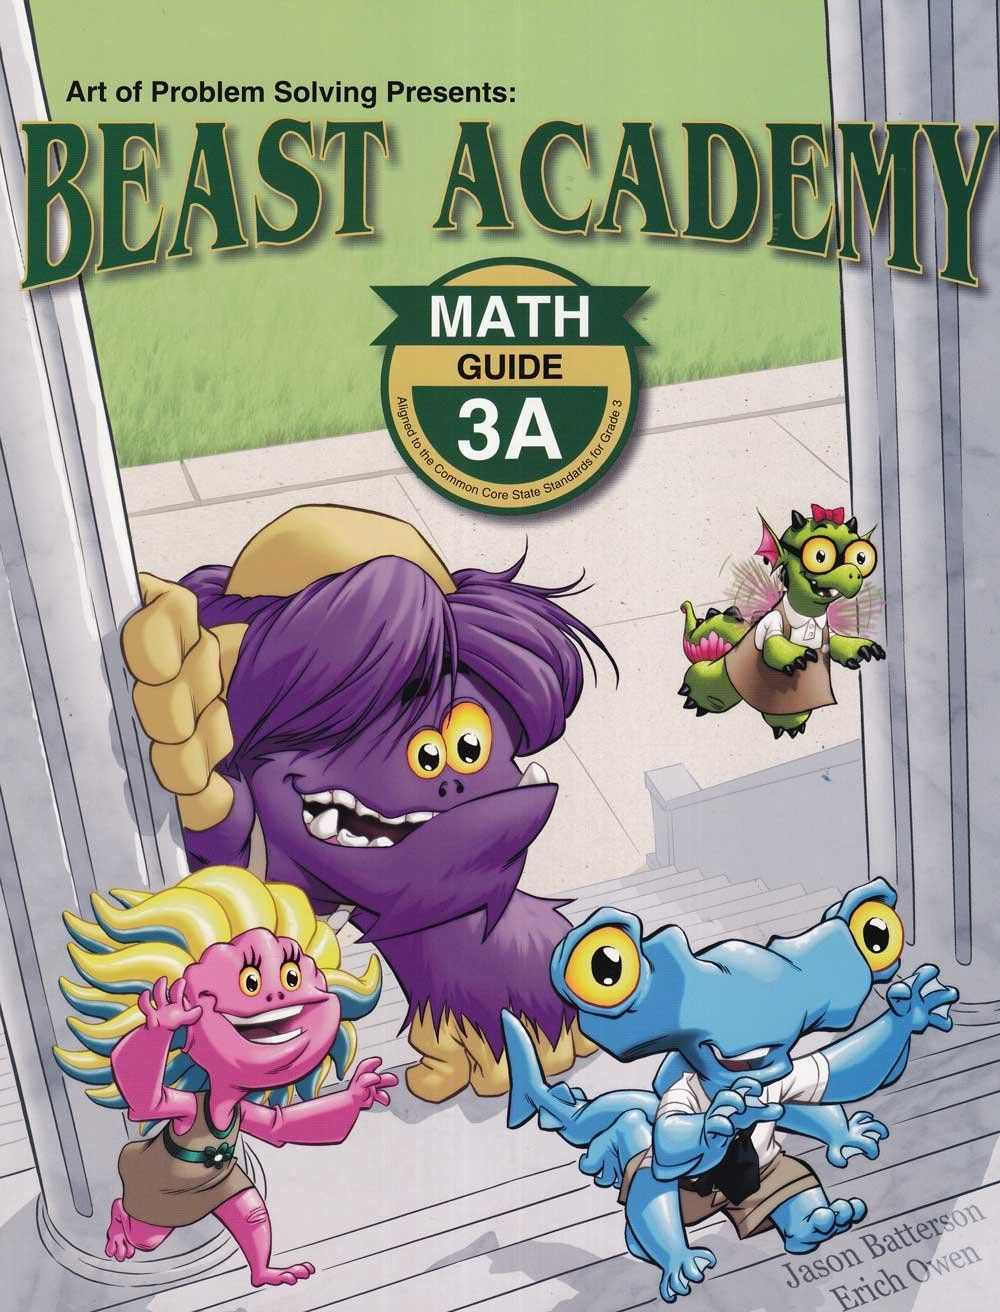 Beast Academy 3A Art of problem solving